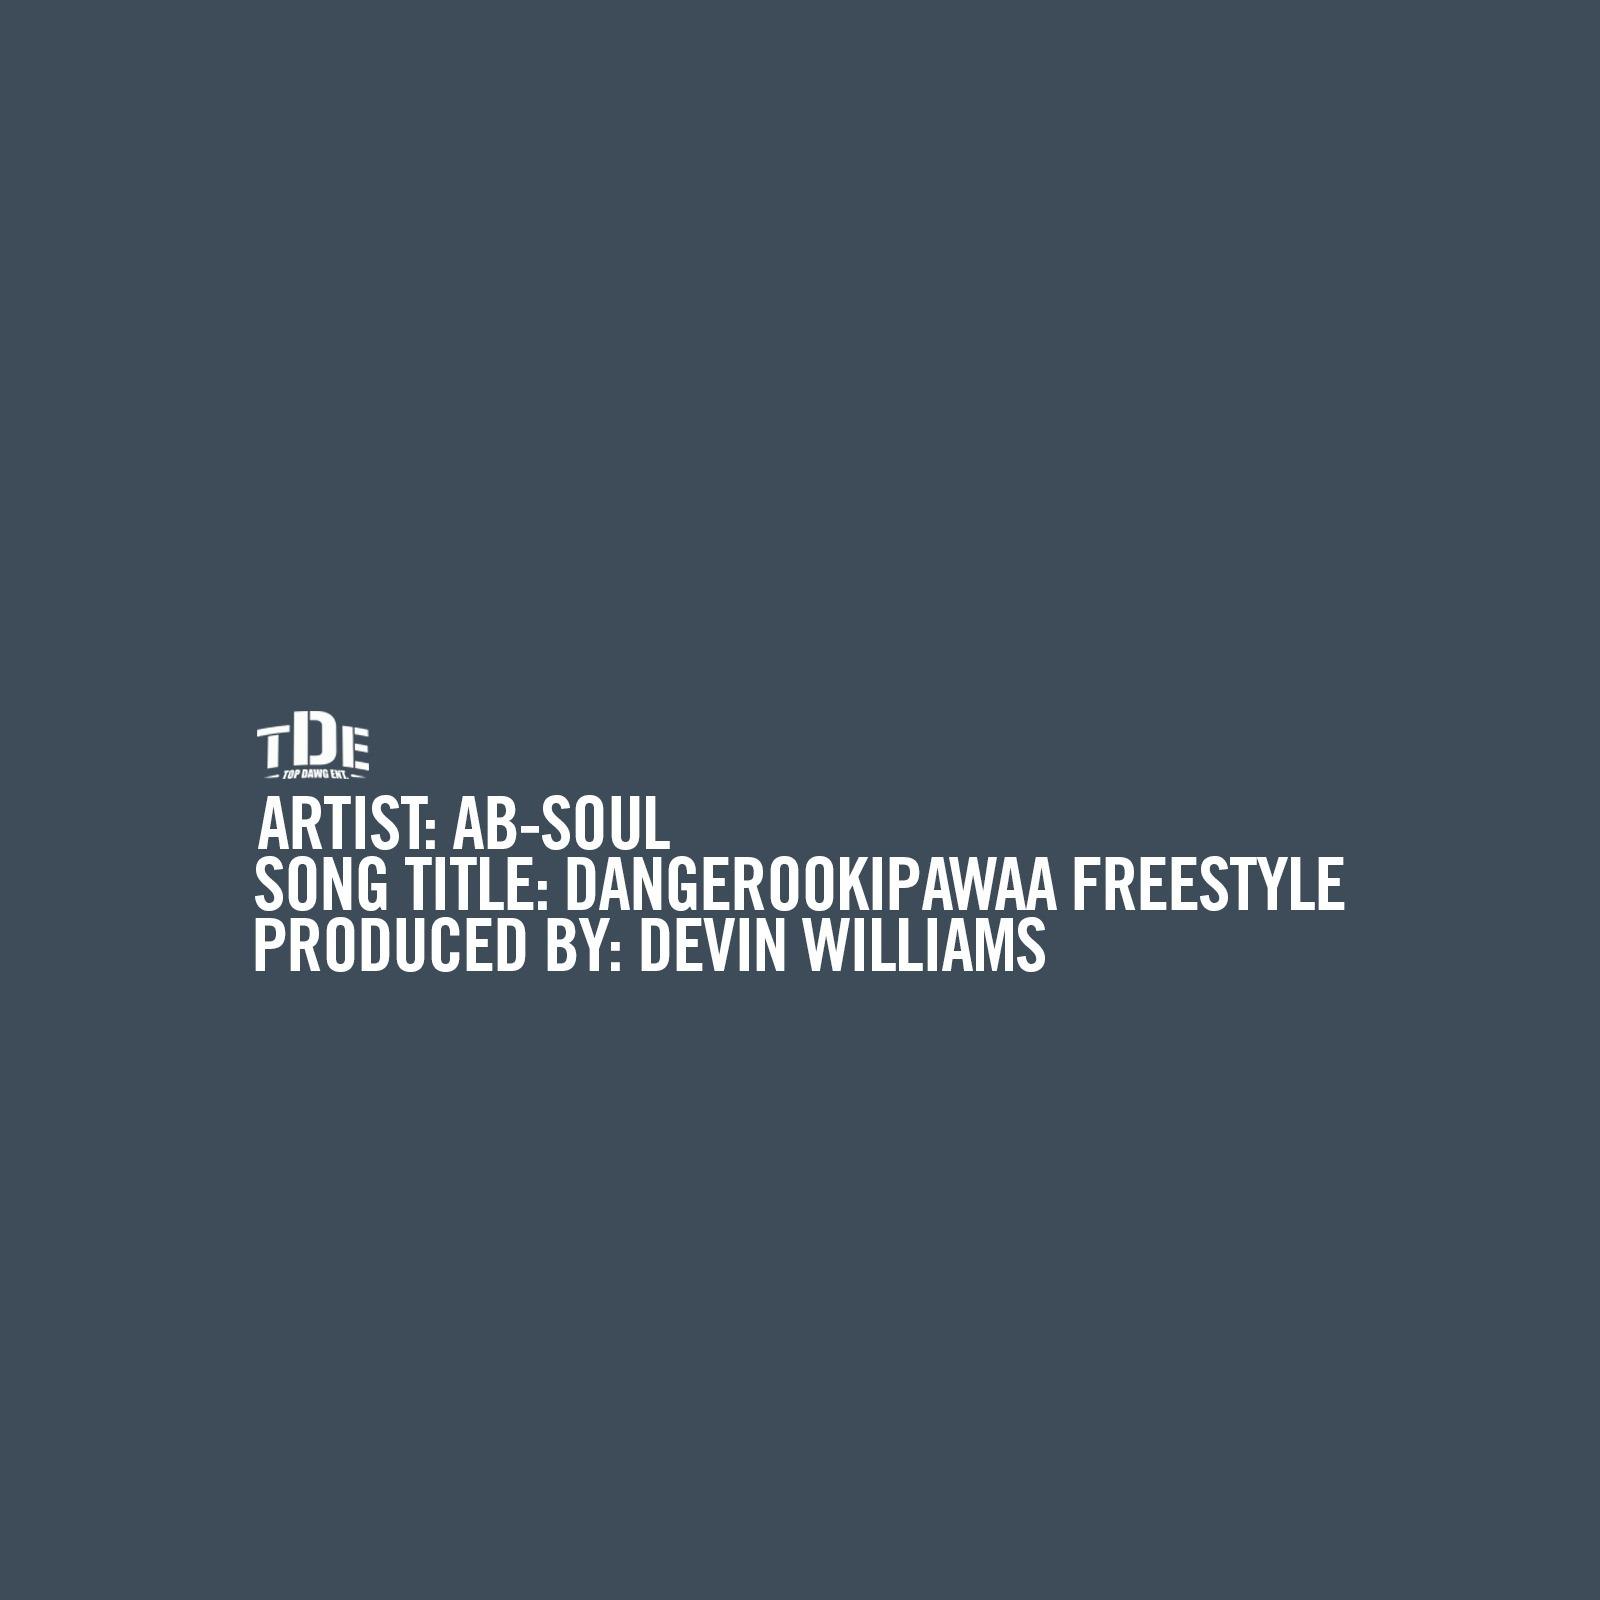 Ab-Soul – Dangerookipawaa (Freestyle)